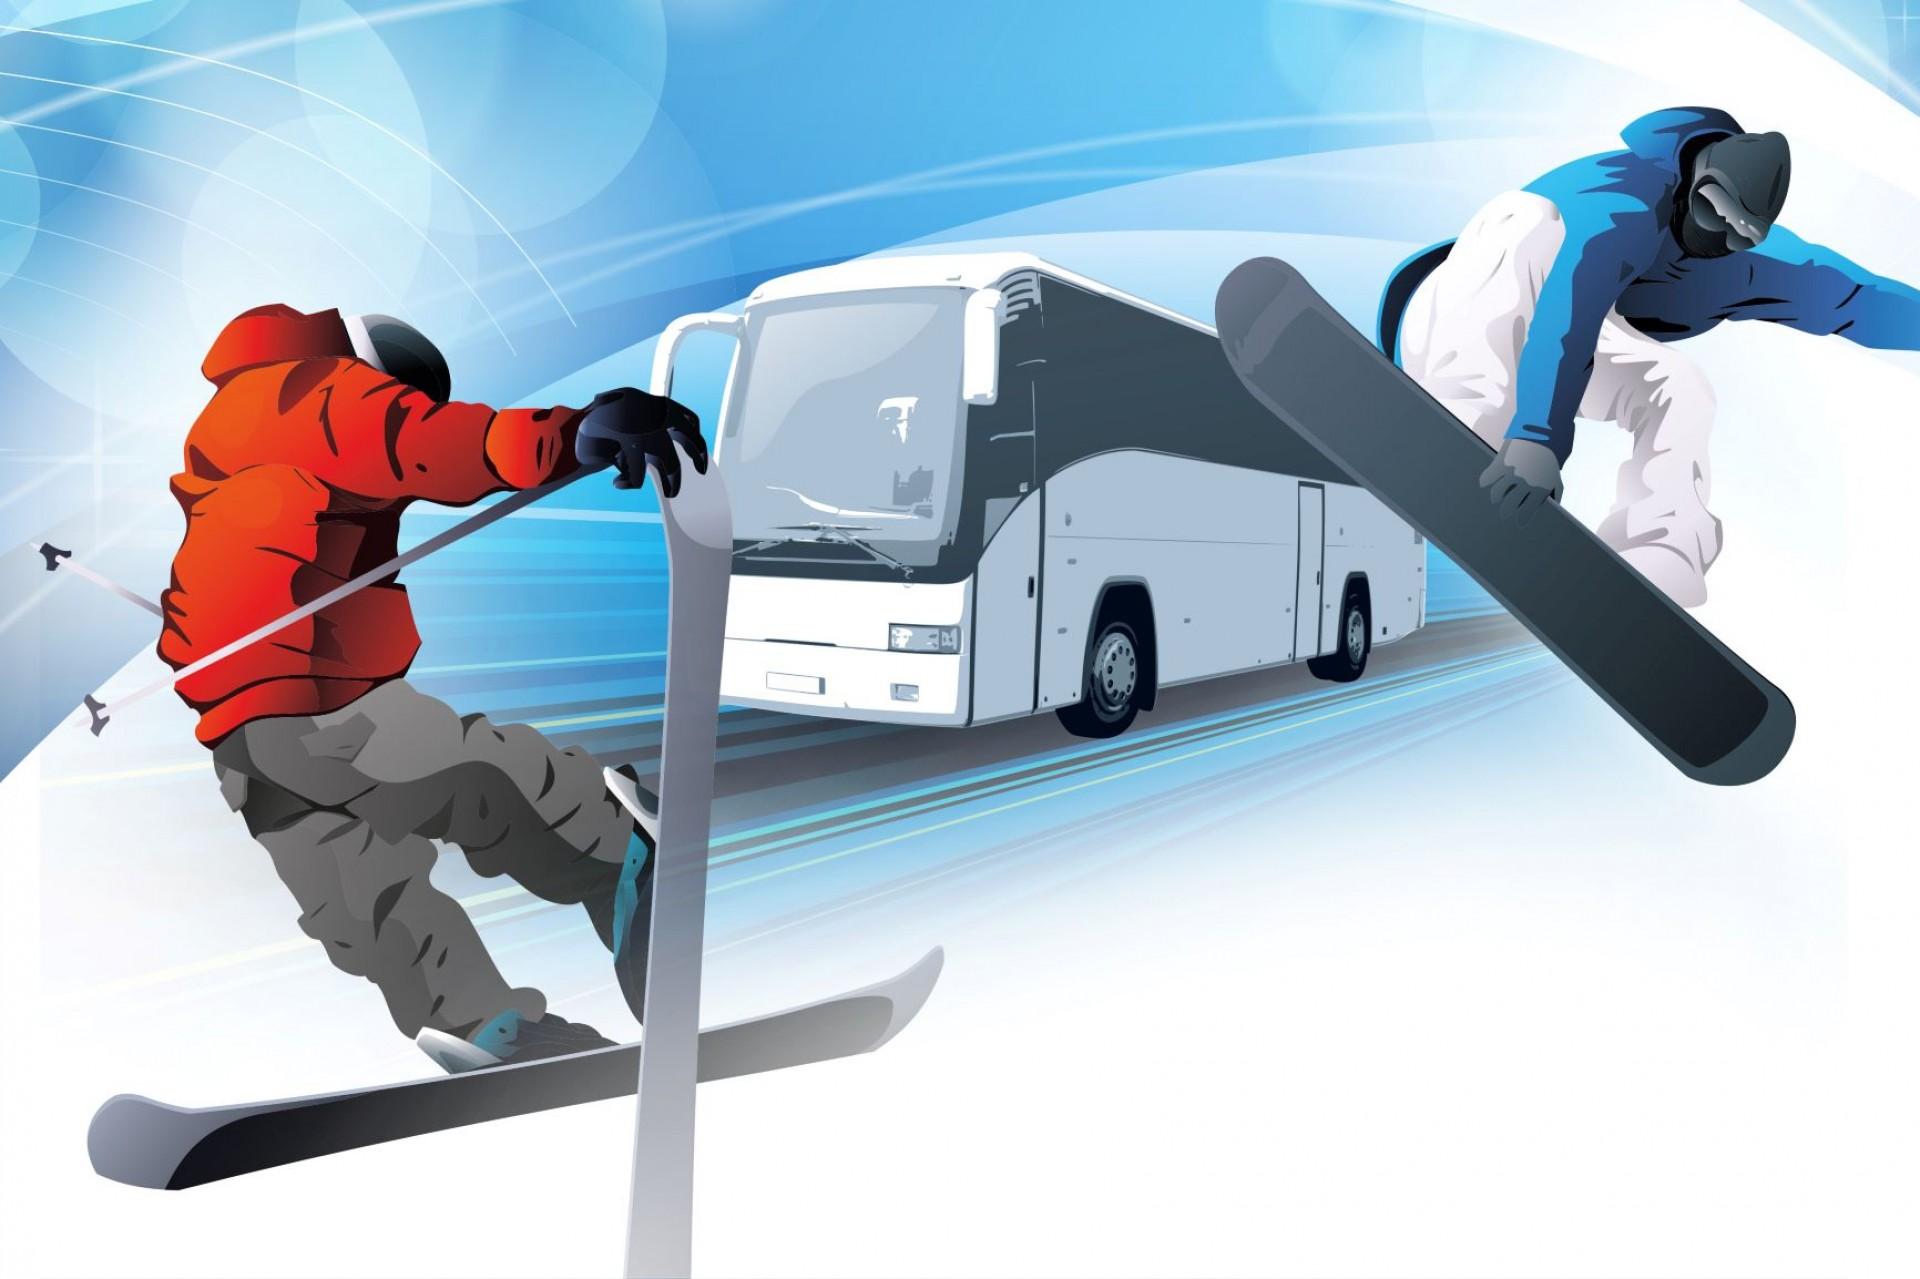 visuel-bus-a-la-neige-2-959